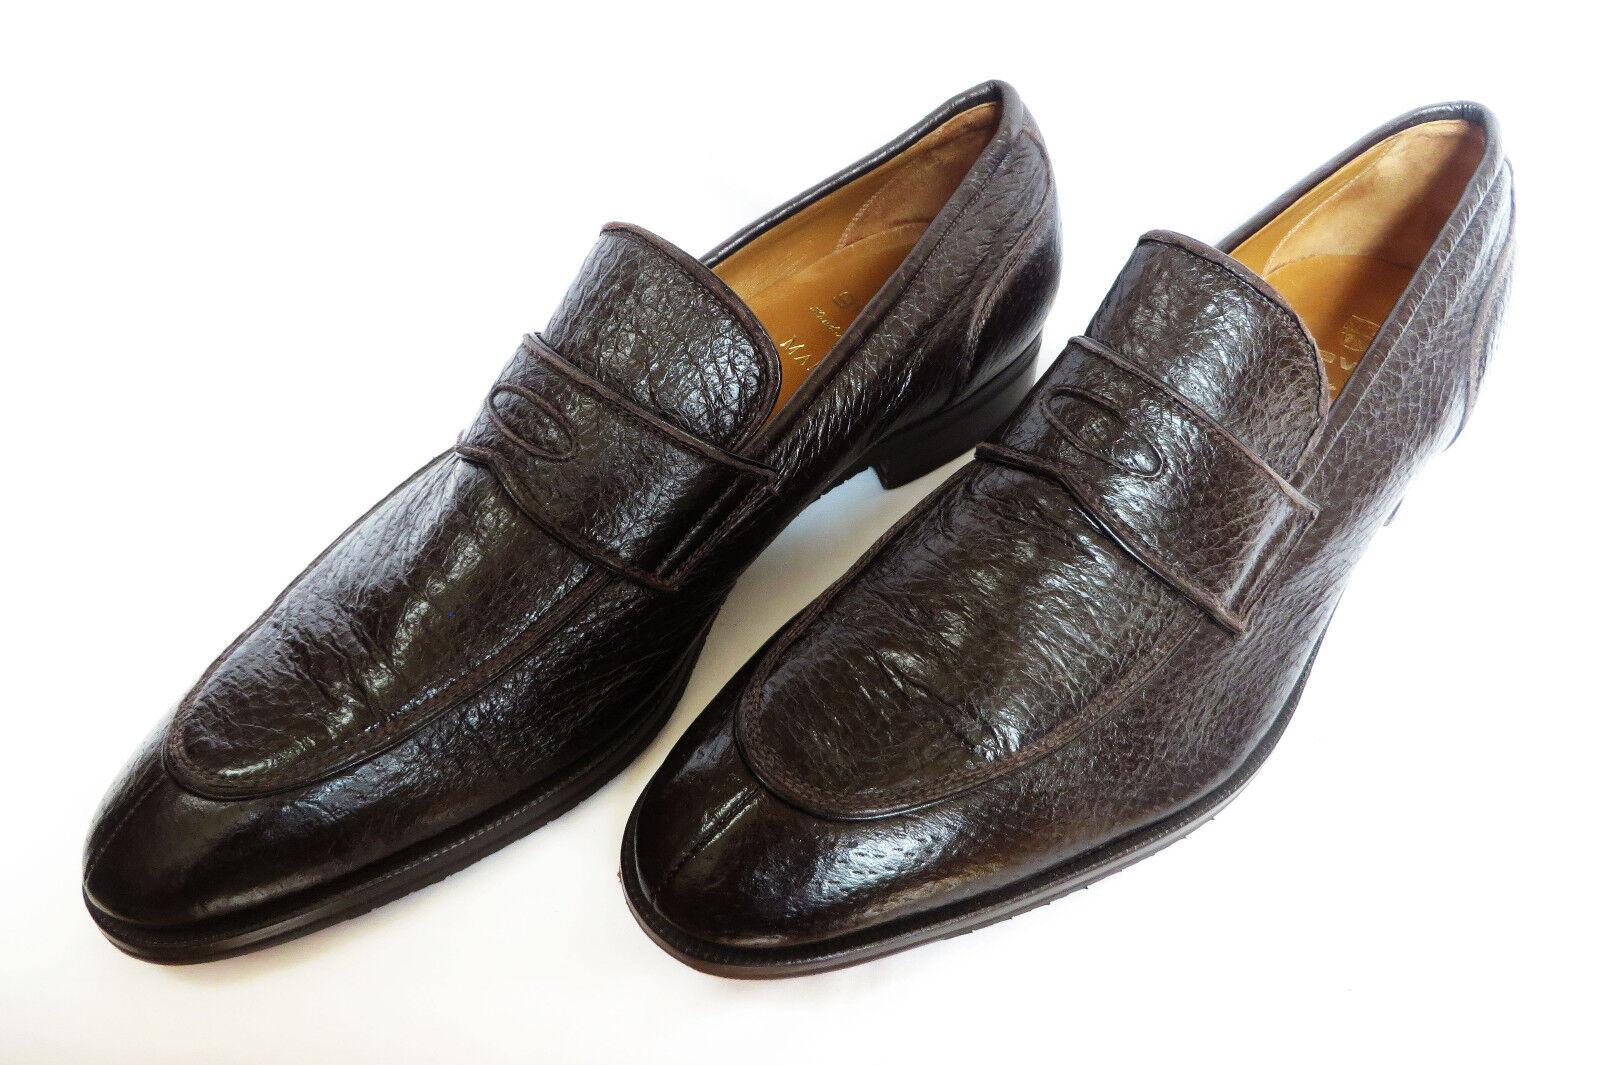 Gravati Italia Para Hombre de Cuero Slip Ons Split Toe peccary PENNY Mocasines zapatos 11